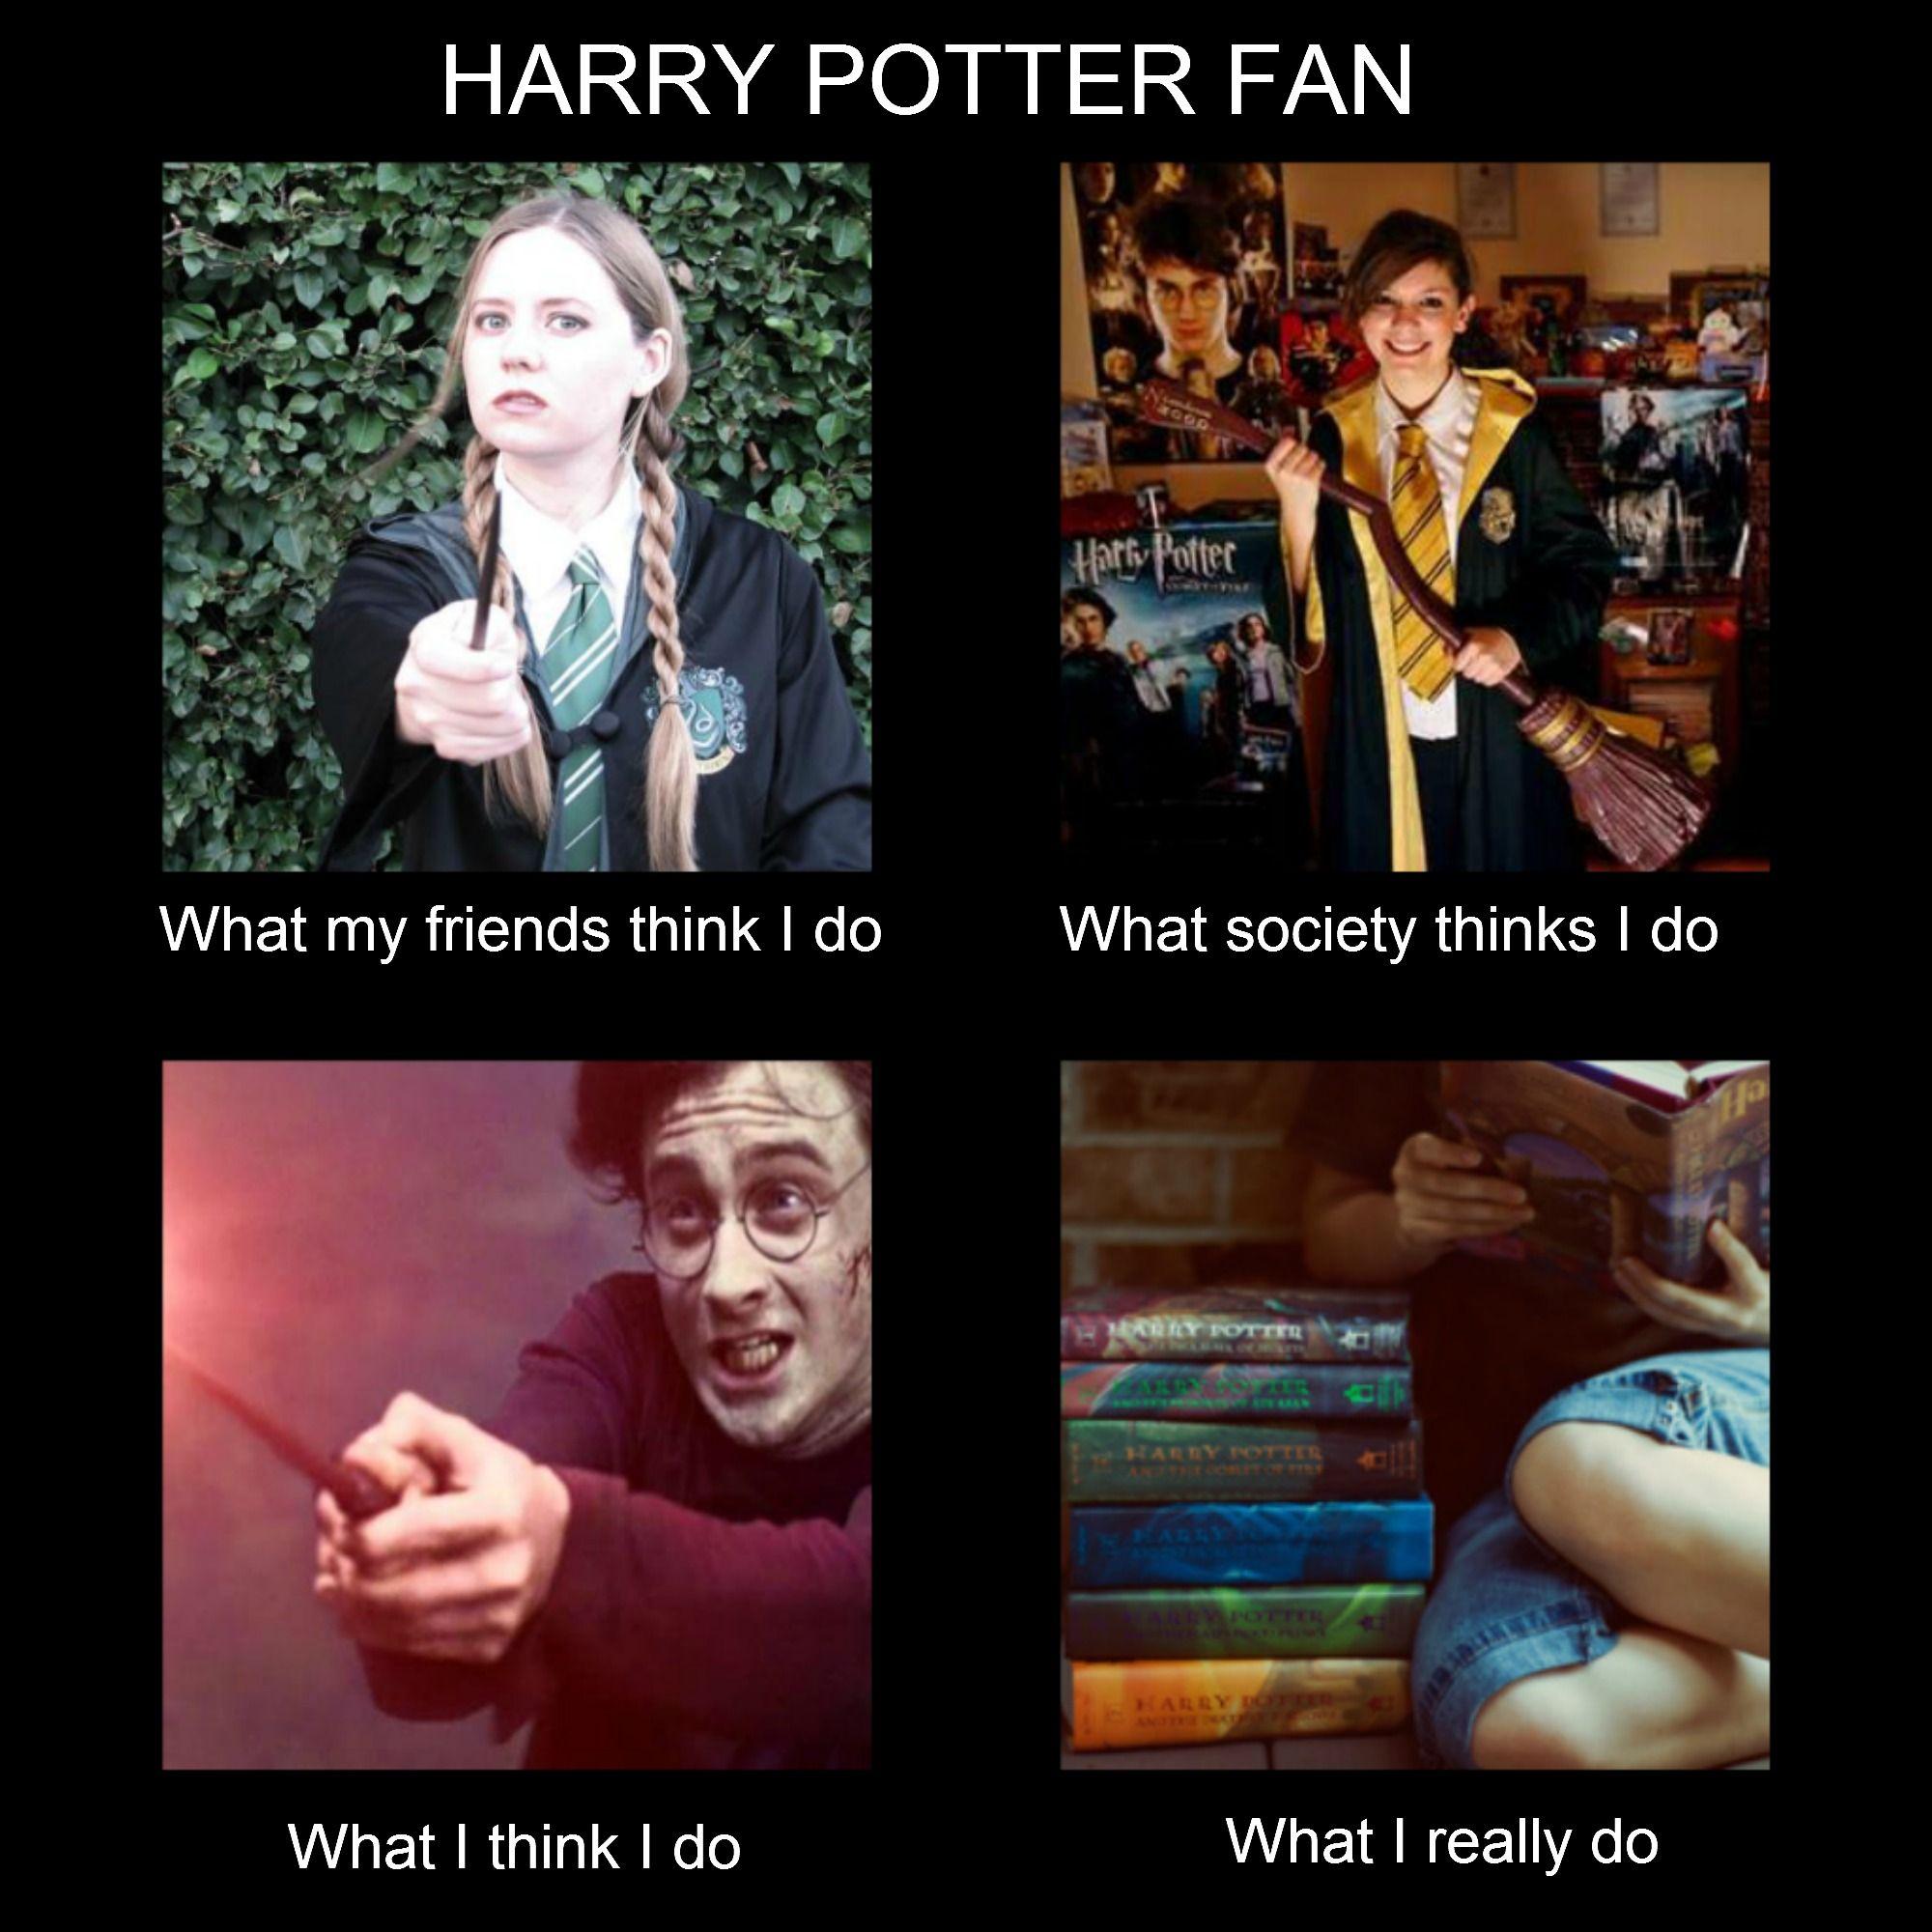 What Harry Potter Fans Do Pretty Accurate Harry Potter Theme Song Harry Potter Fandom Harry Potter Fan